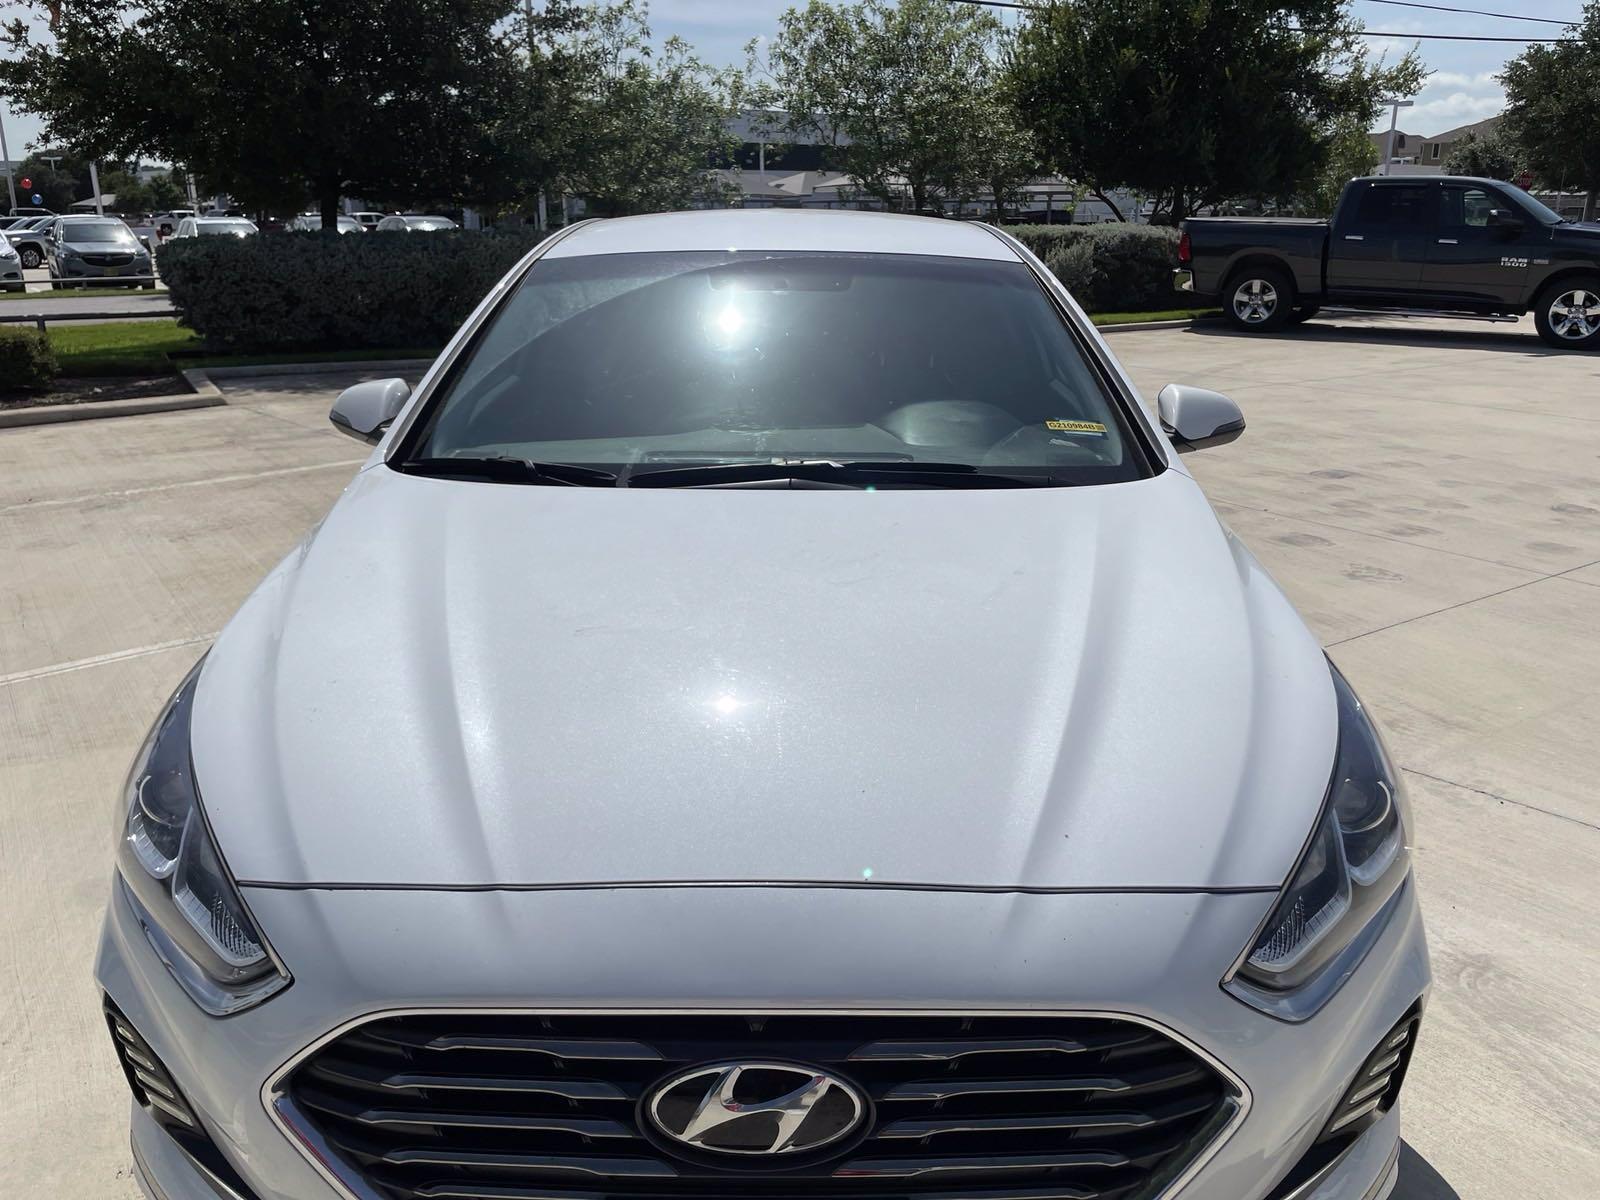 2018 Hyundai Sonata Vehicle Photo in SELMA, TX 78154-1459